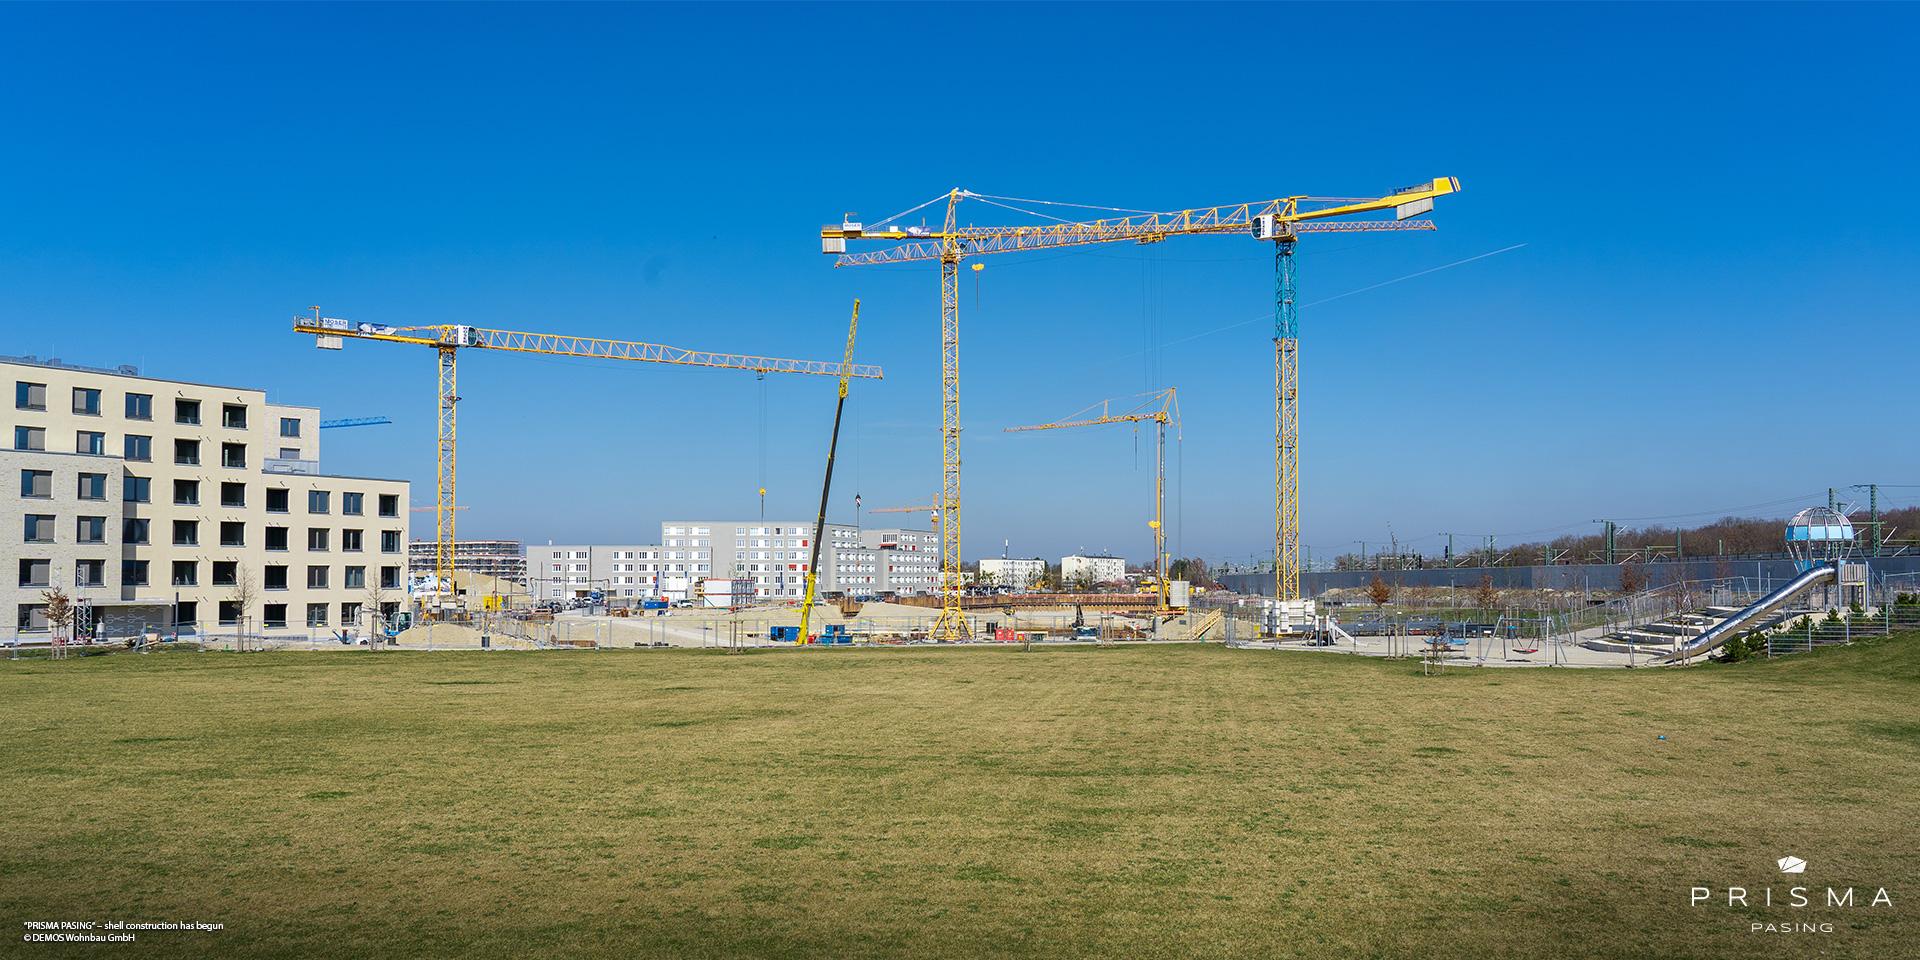 'PRISMA PASING' in Pasing-Obermenzing: Shell construction work has begun